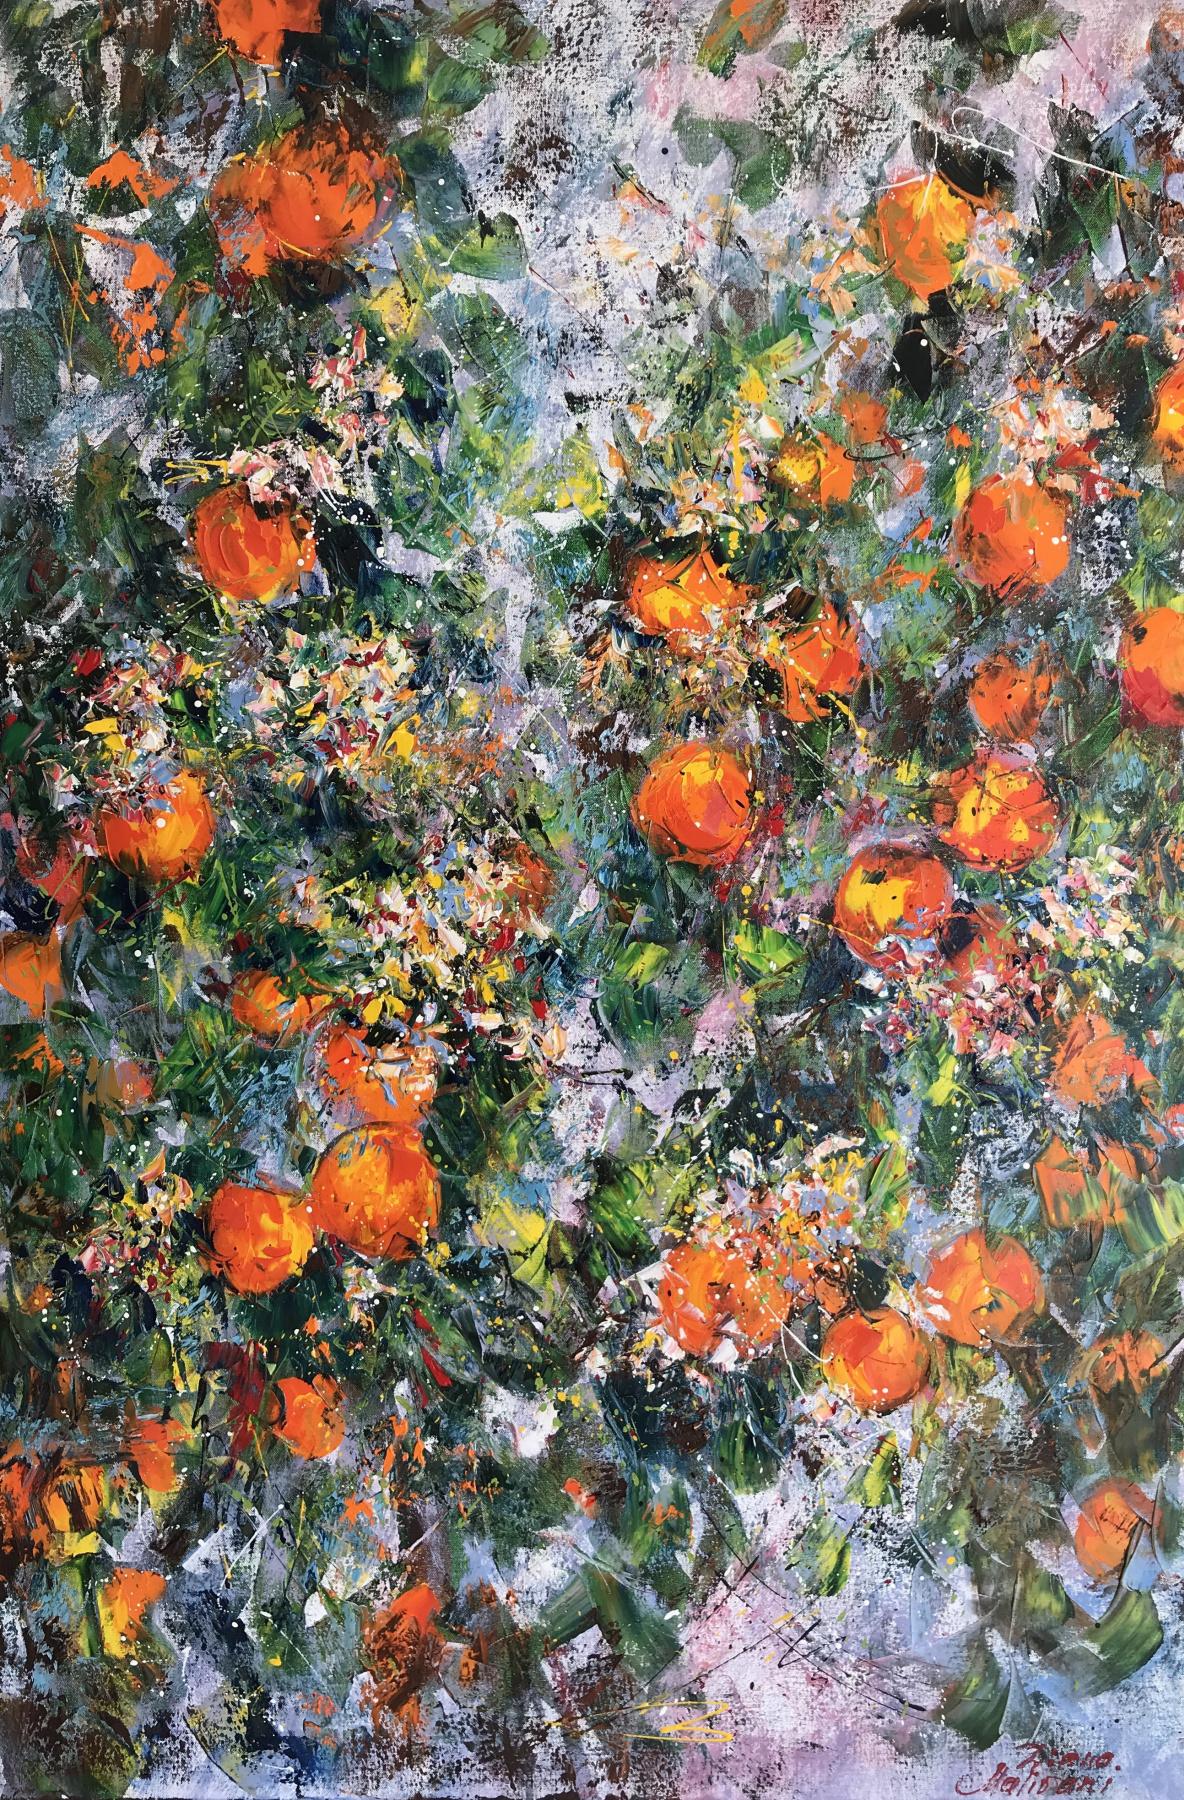 Диана Владимировна Маливани. Blooming Orange Tree